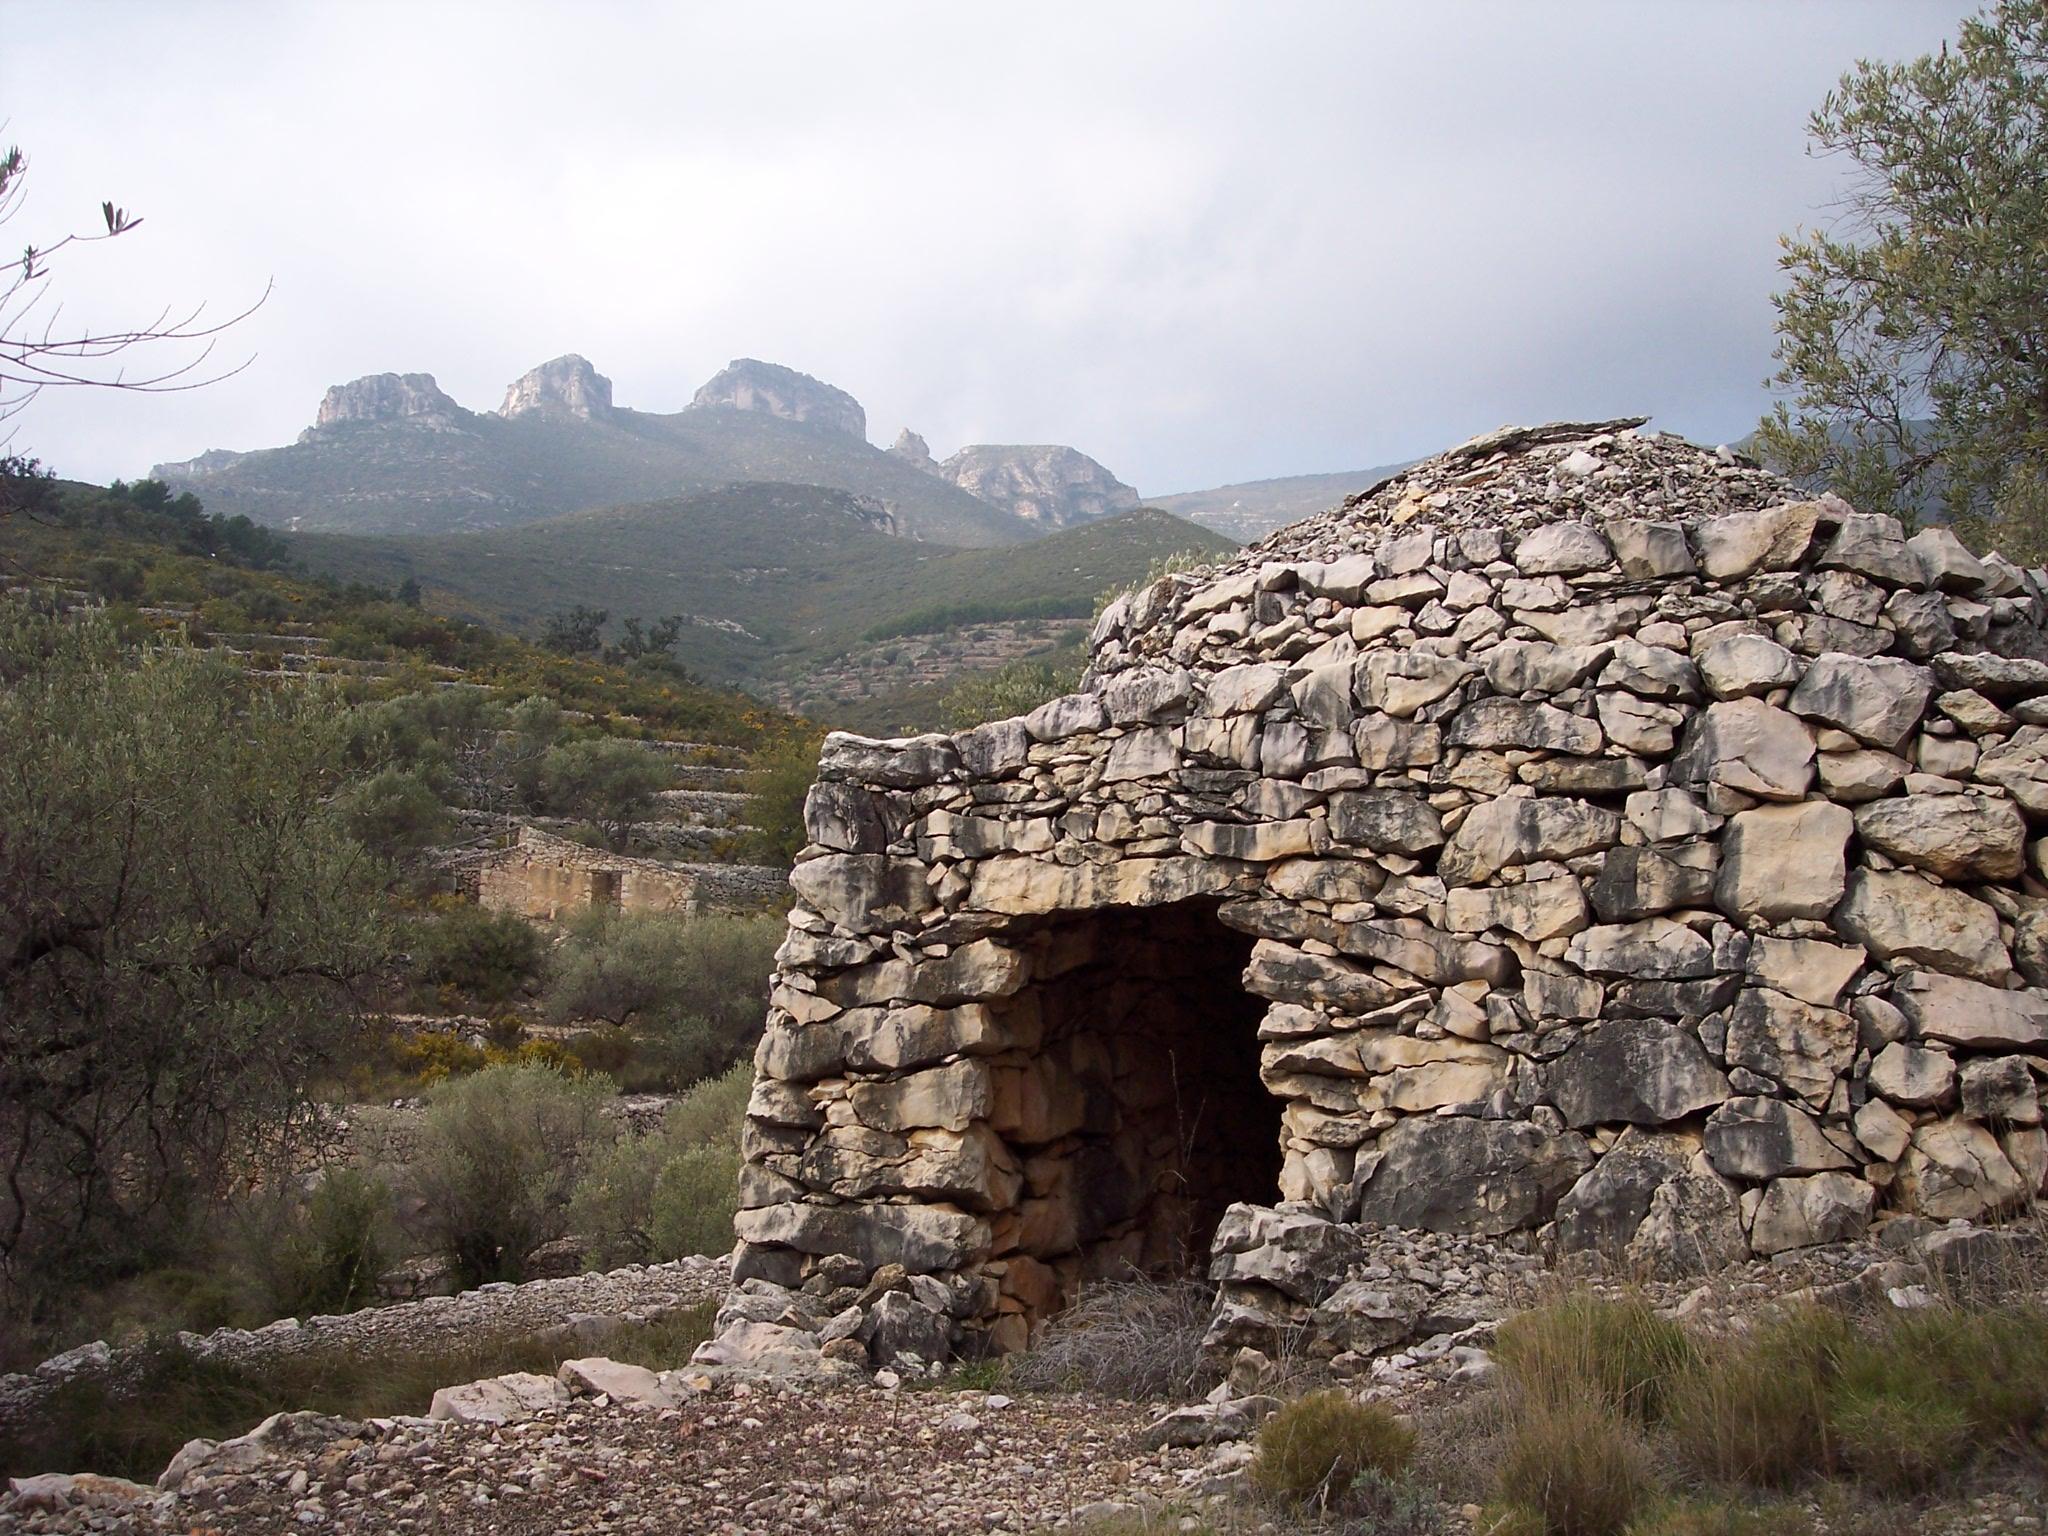 <p><strong>Unitat de Paisatge: </strong>Plana del Baix Ebre — Montsià<strong><br /> </strong></p> <p><strong>Municipi:</strong>La Sénia</p> <p><strong>Autor:</strong> Observatori del Paisatge de Catalunya</p> <p><strong>Crèdit:</strong> Arxiu d'imatges de l'Observatori del Paisatge de Catalunya</p> <p><strong>Reproducció:</strong> CC BY-NC-ND 4.0</p>  <a href='http://arxiu.catpaisatge.net/wp-content/uploads/2019/04/la-Senia-Montsia-Plana-del-Baix-Ebre-Montsia.jpg'' class='download-button' download>Descarrega</a> <a href='http://arxiu.catpaisatge.net/cercador/?details.vm?q=id:0000006316' target='blank' class='fitxa-button' >Fitxa</a>